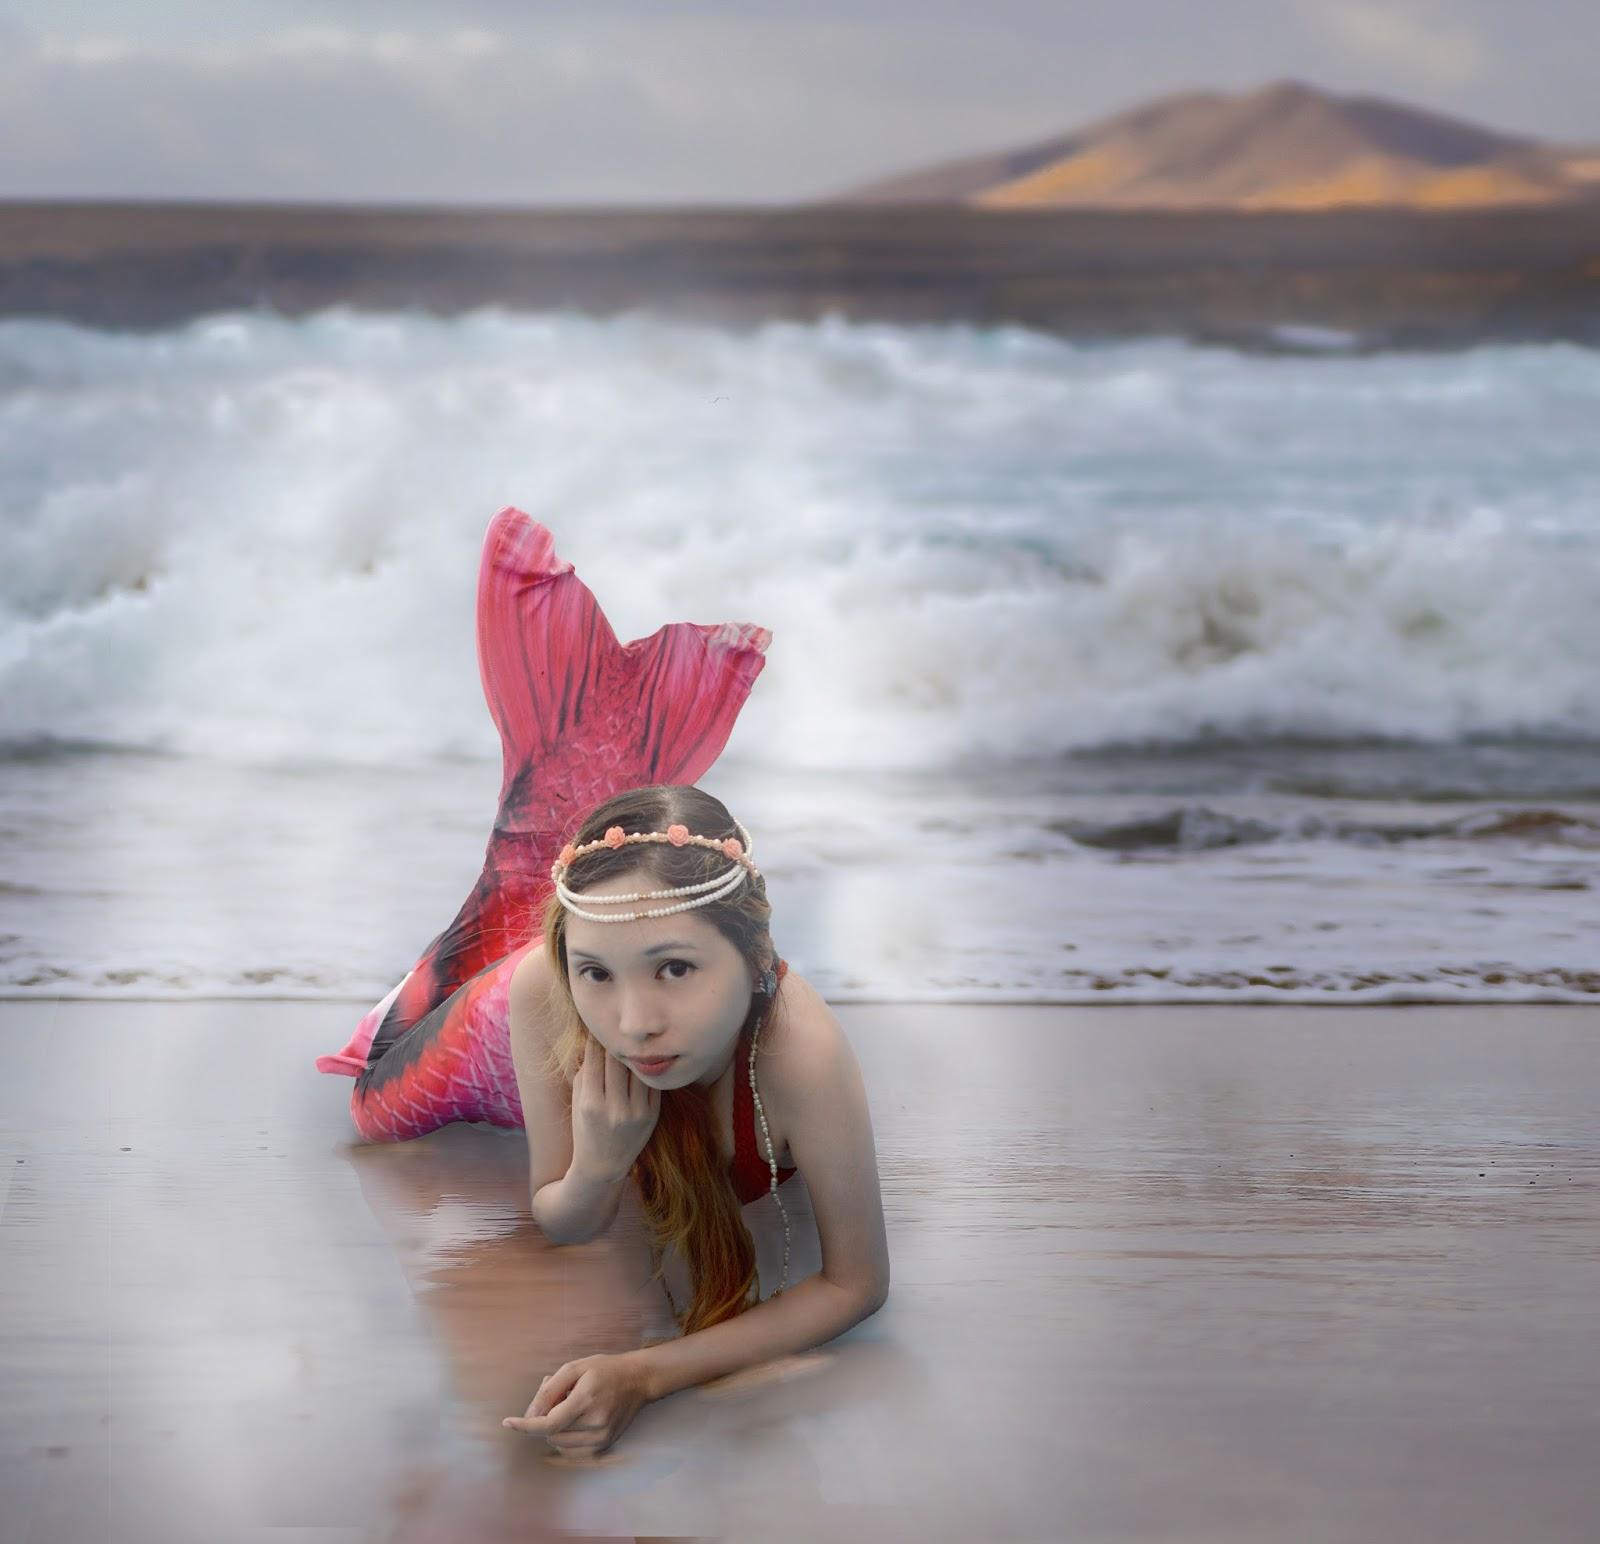 Mermaid 101